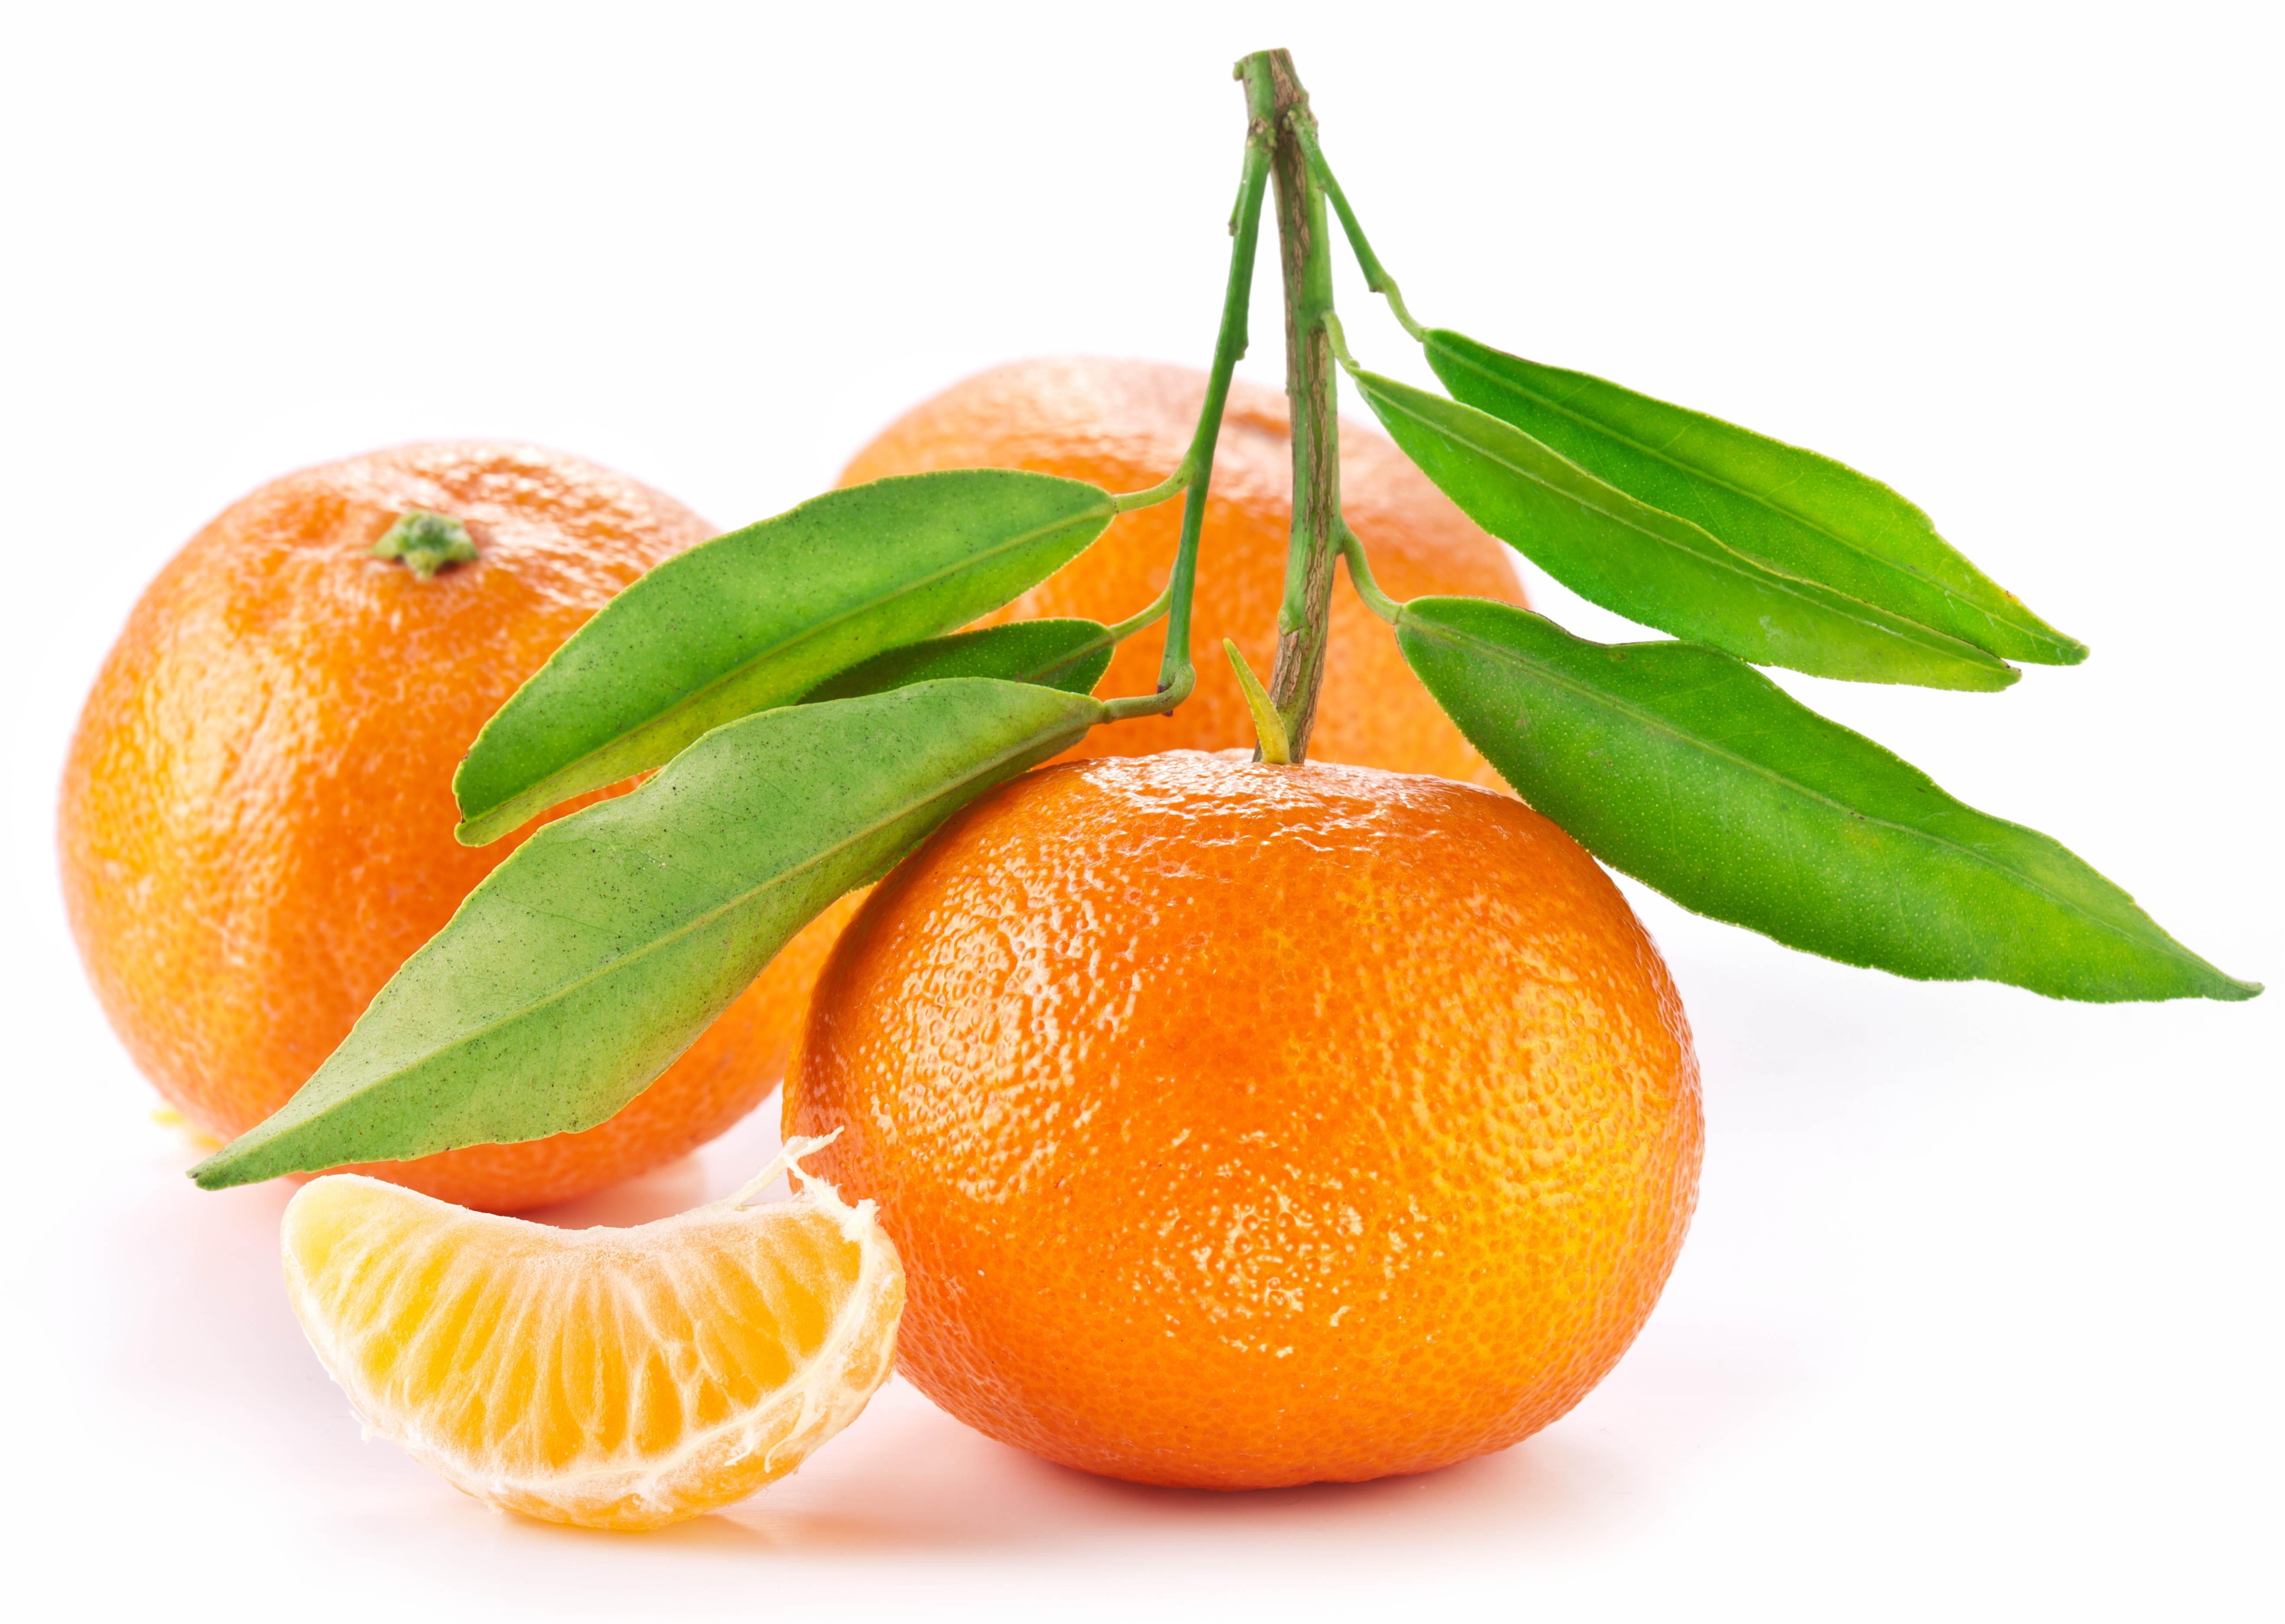 Download wallpaper 5267x3744 orange fruit white background leaf 5267x3744